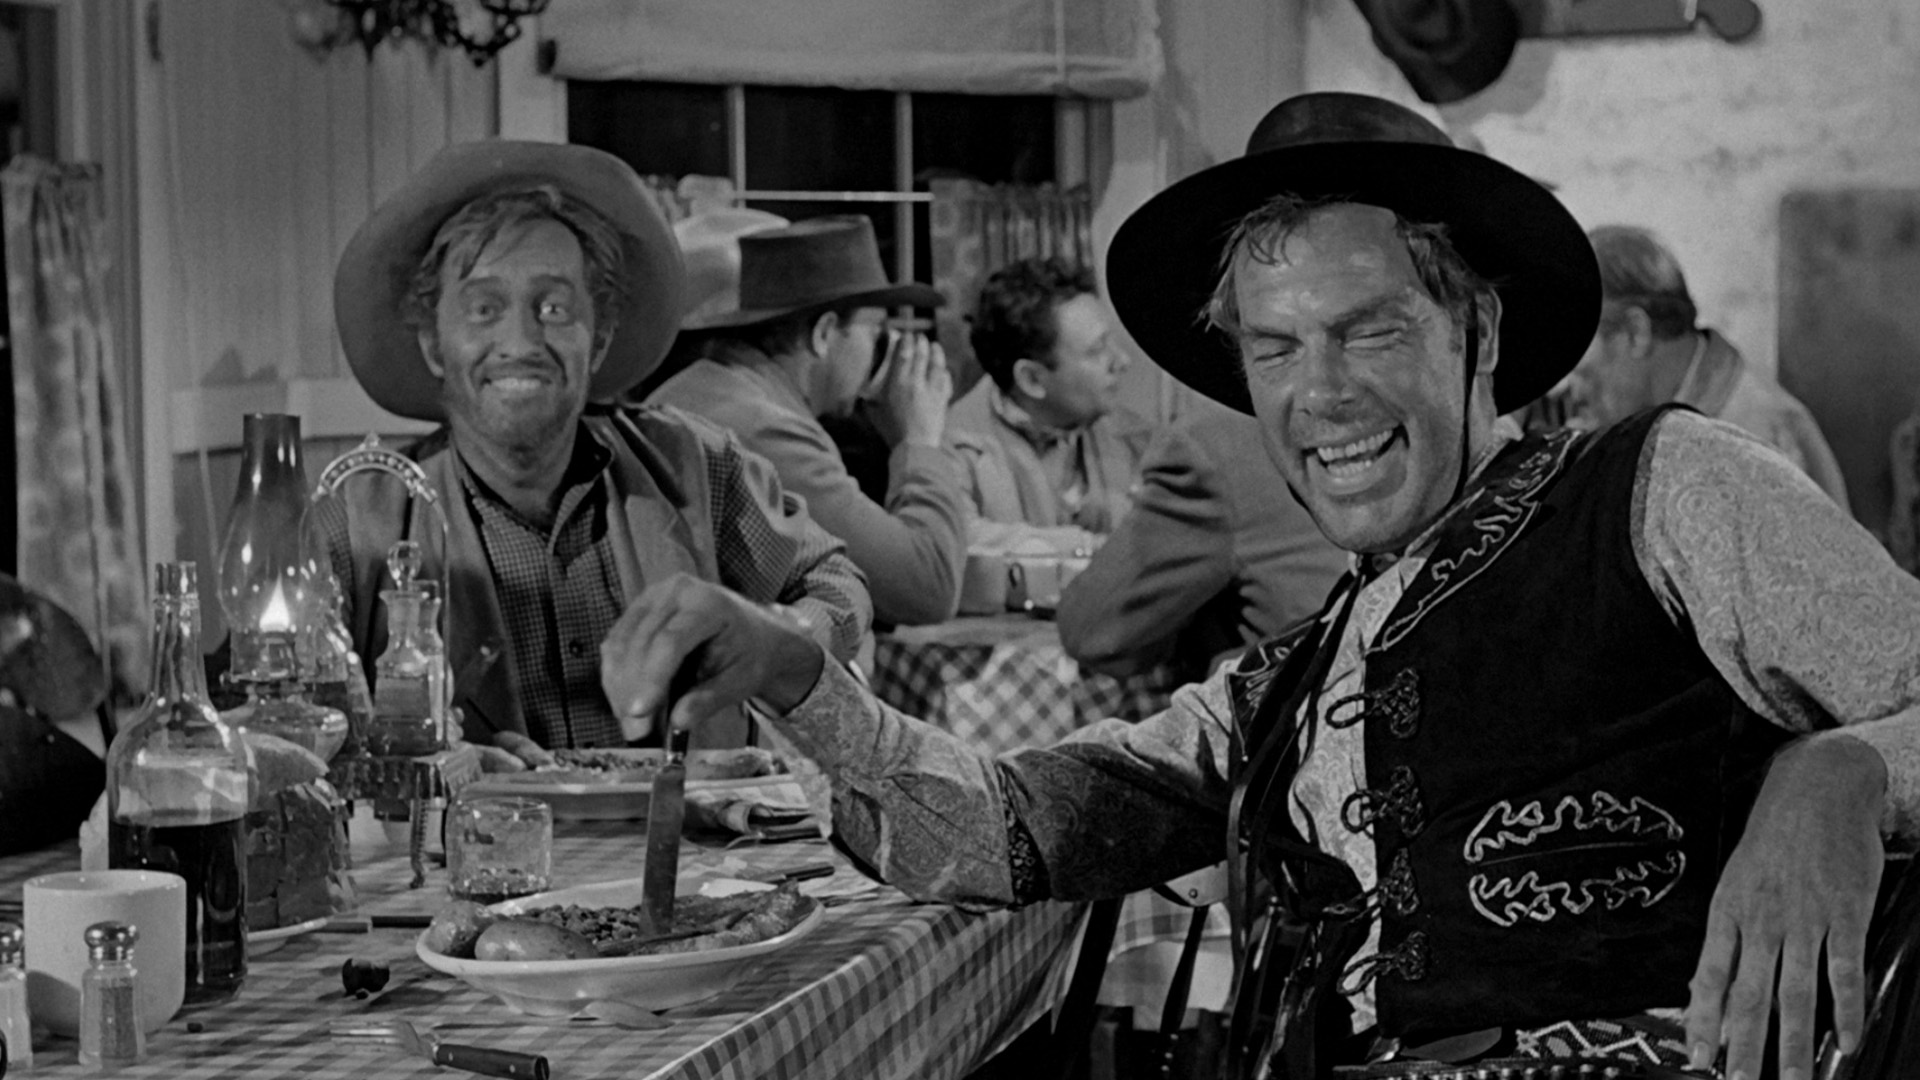 1962 - The Man Who Shot Liberty Valance - L'Homme Qui Tua Liberty Valance